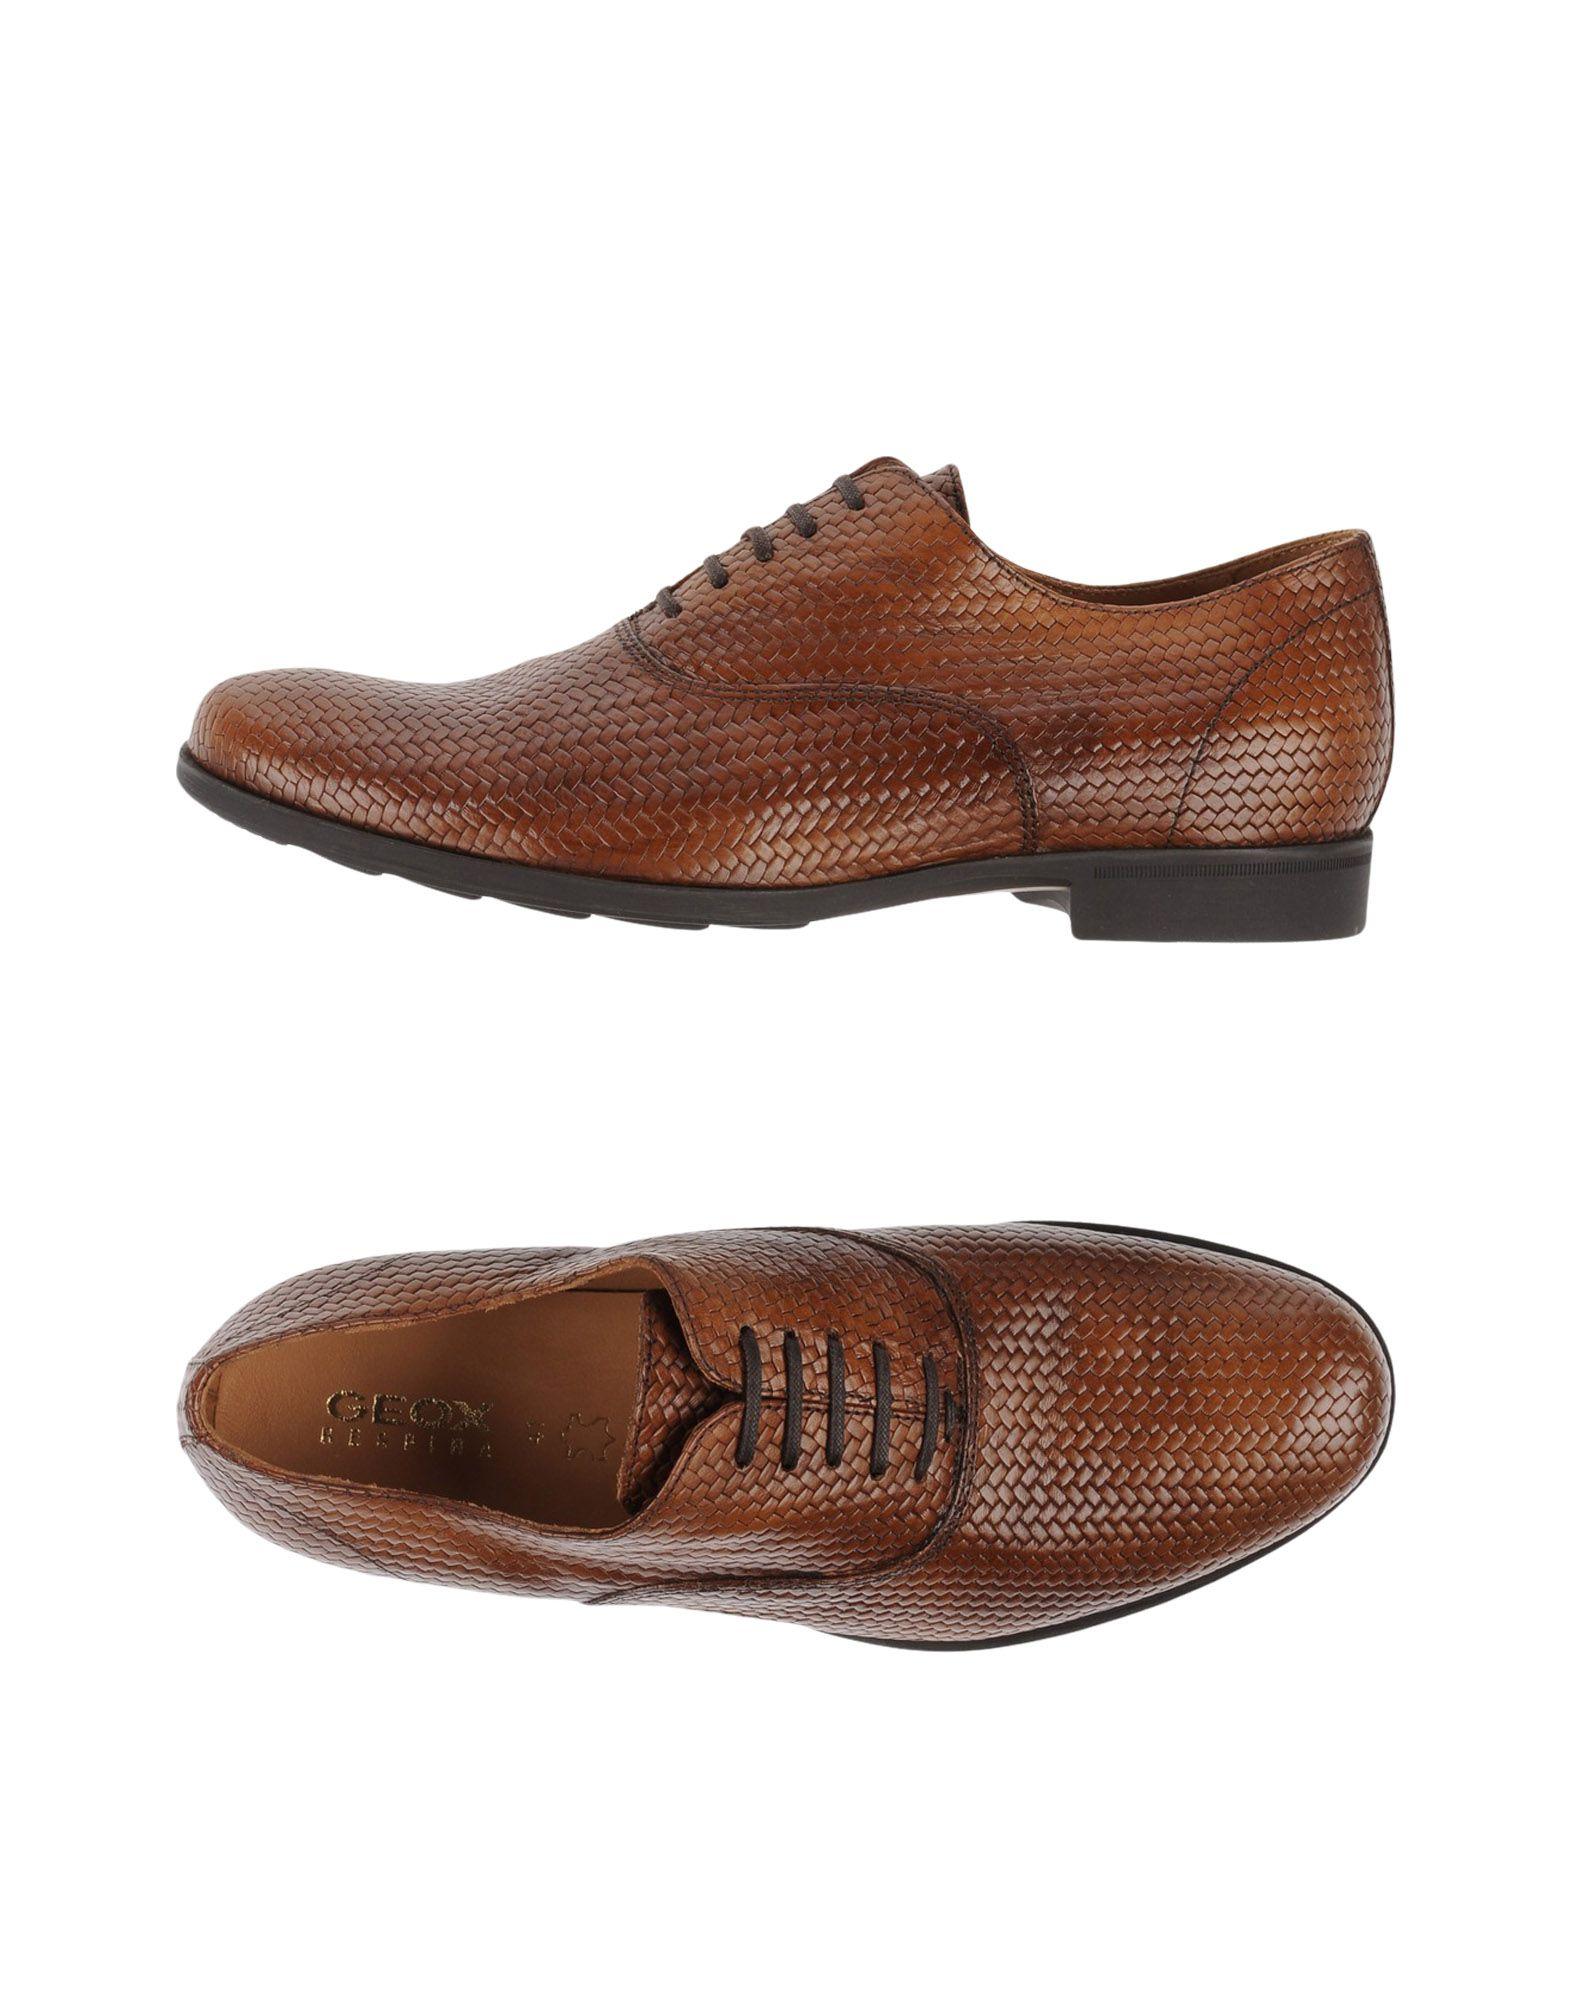 Фото - GEOX Обувь на шнурках обувь на высокой платформе dkny